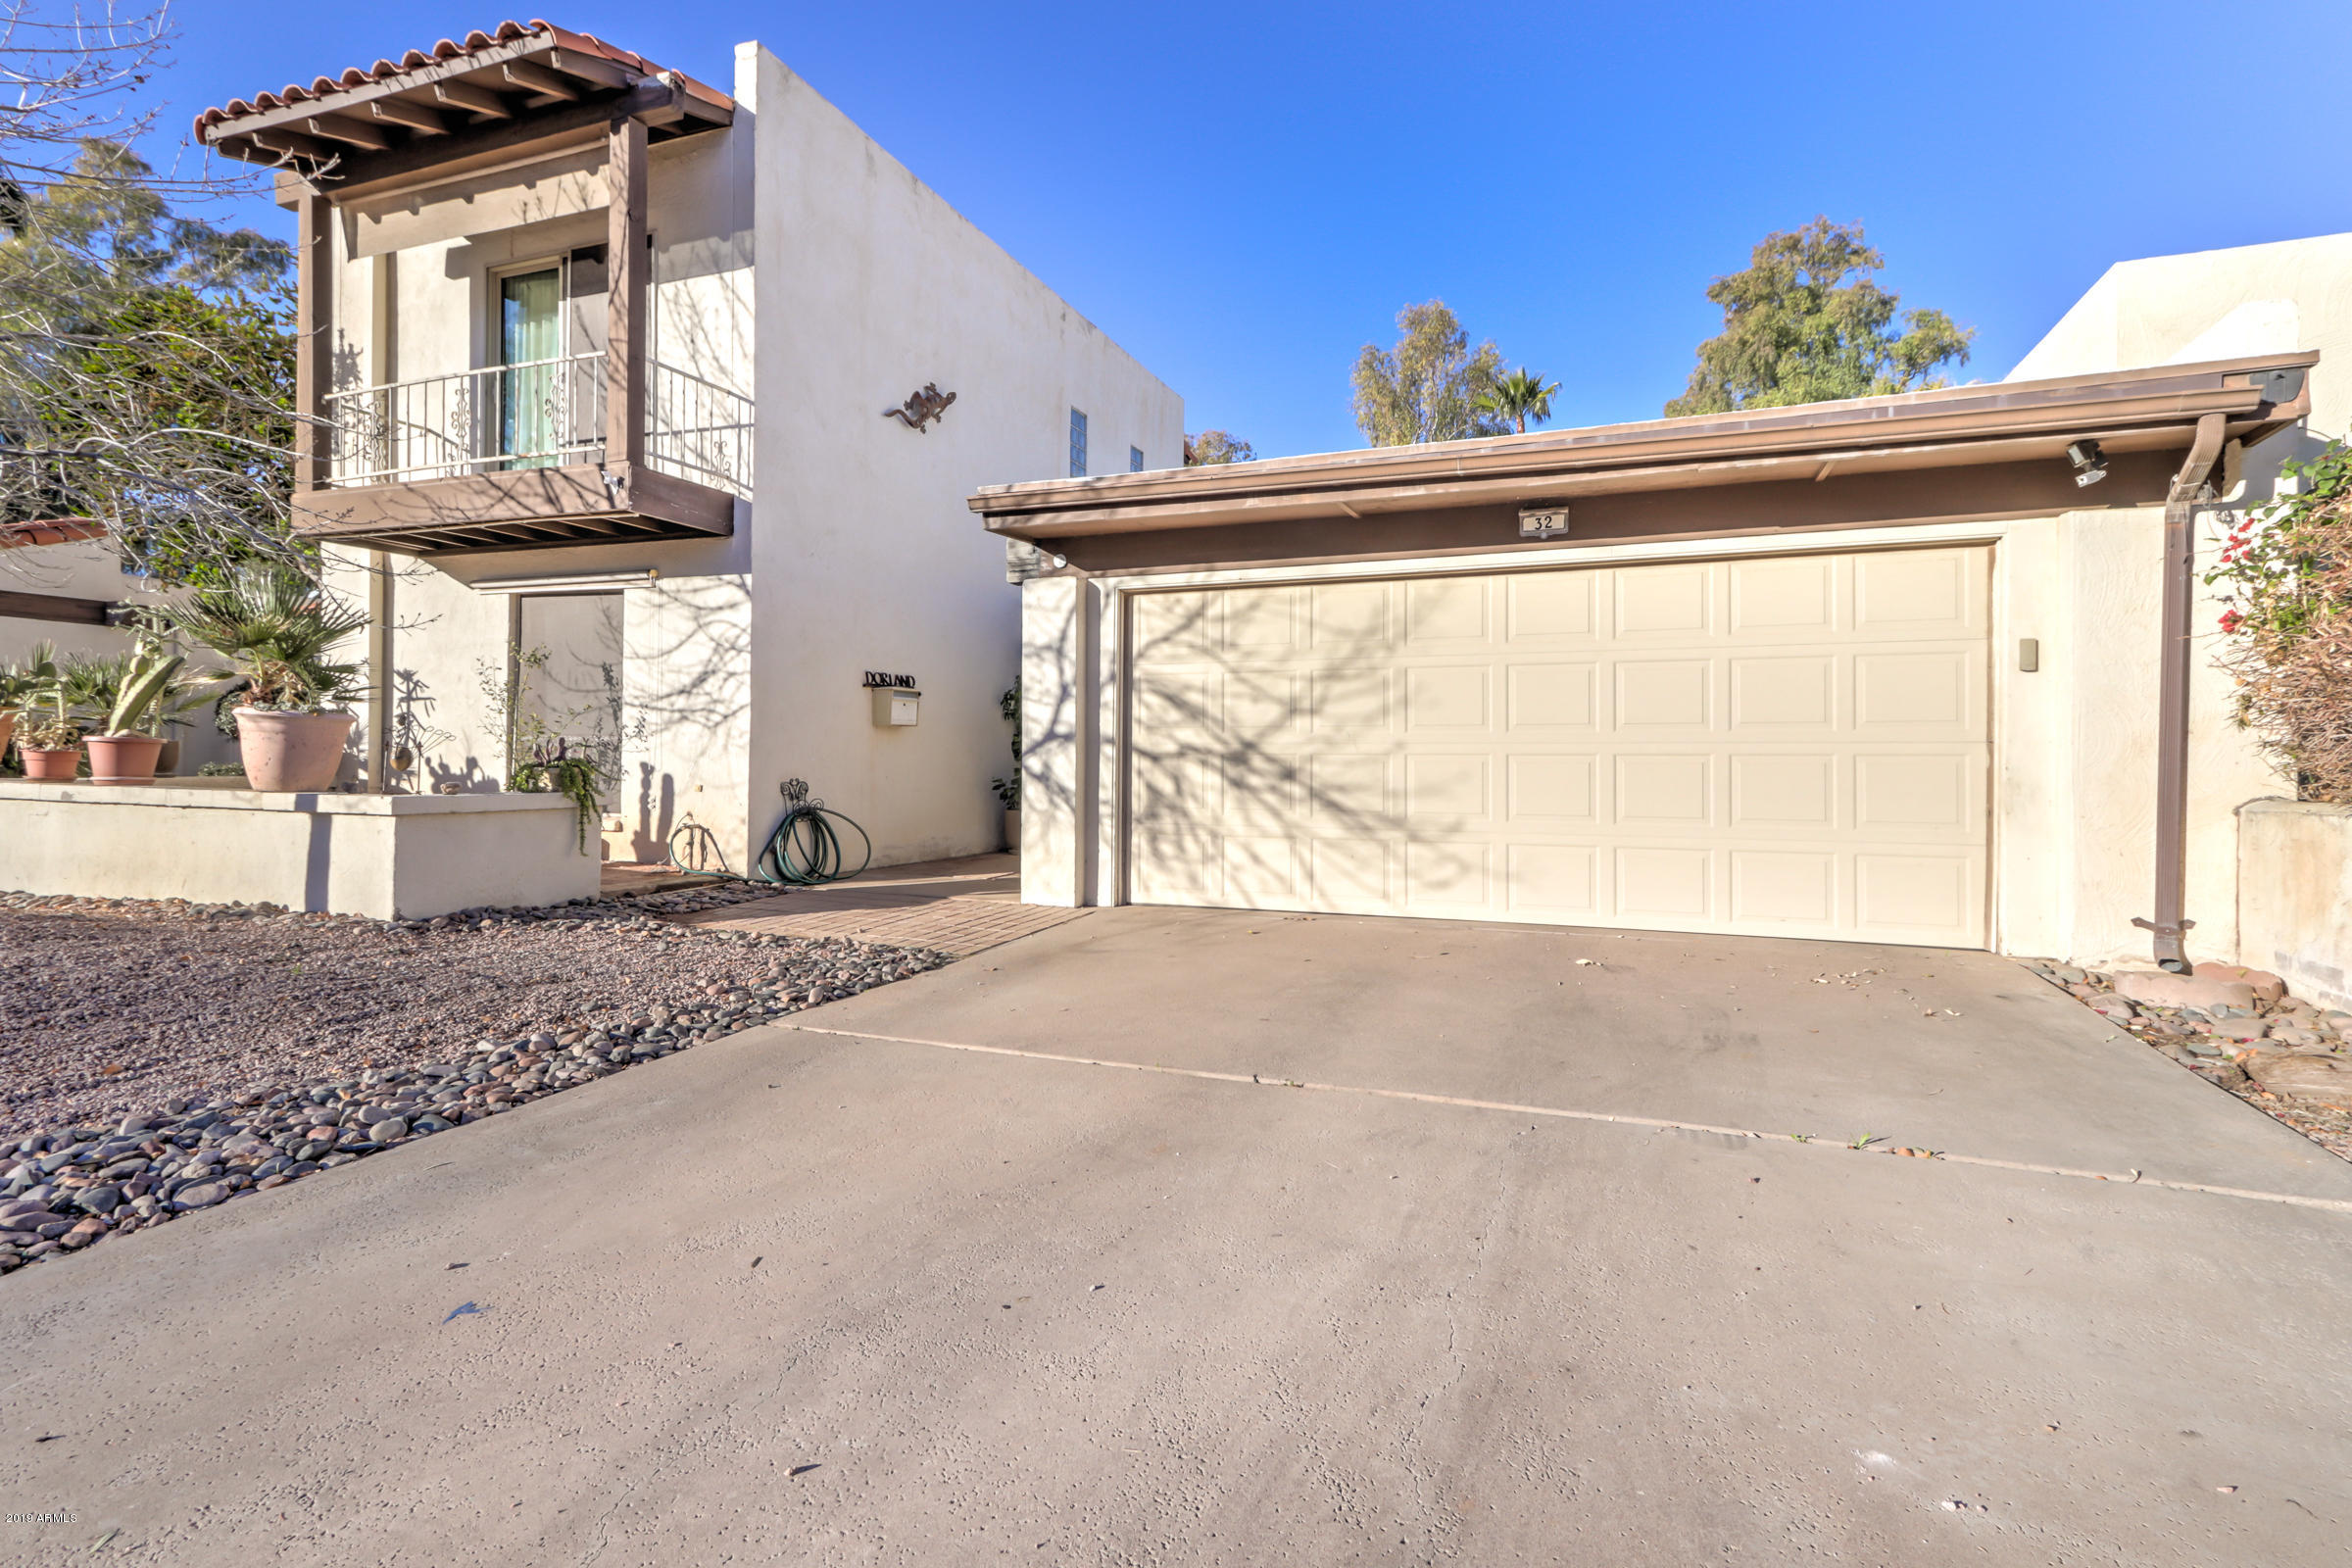 Photo of 1500 N MARKDALE Street #32, Mesa, AZ 85201